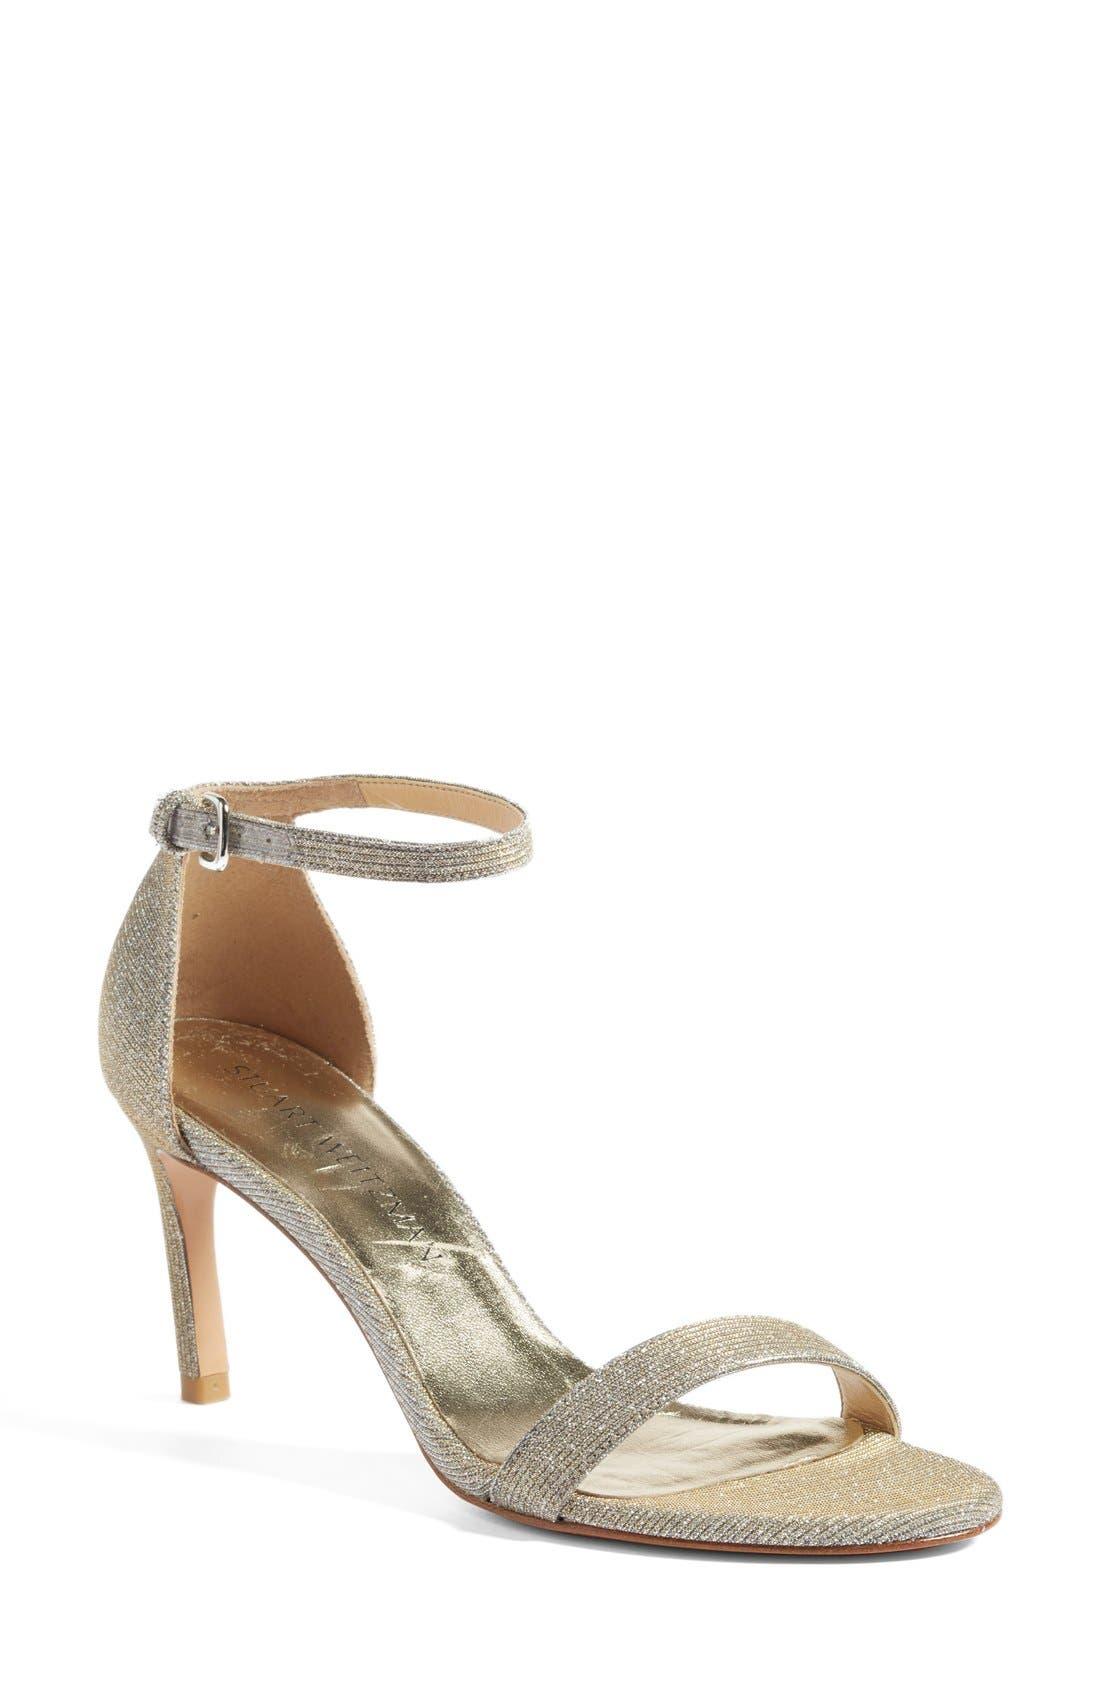 Stuart Weitzman 'Nunaked' Leather Ankle Strap Sandal (Women)